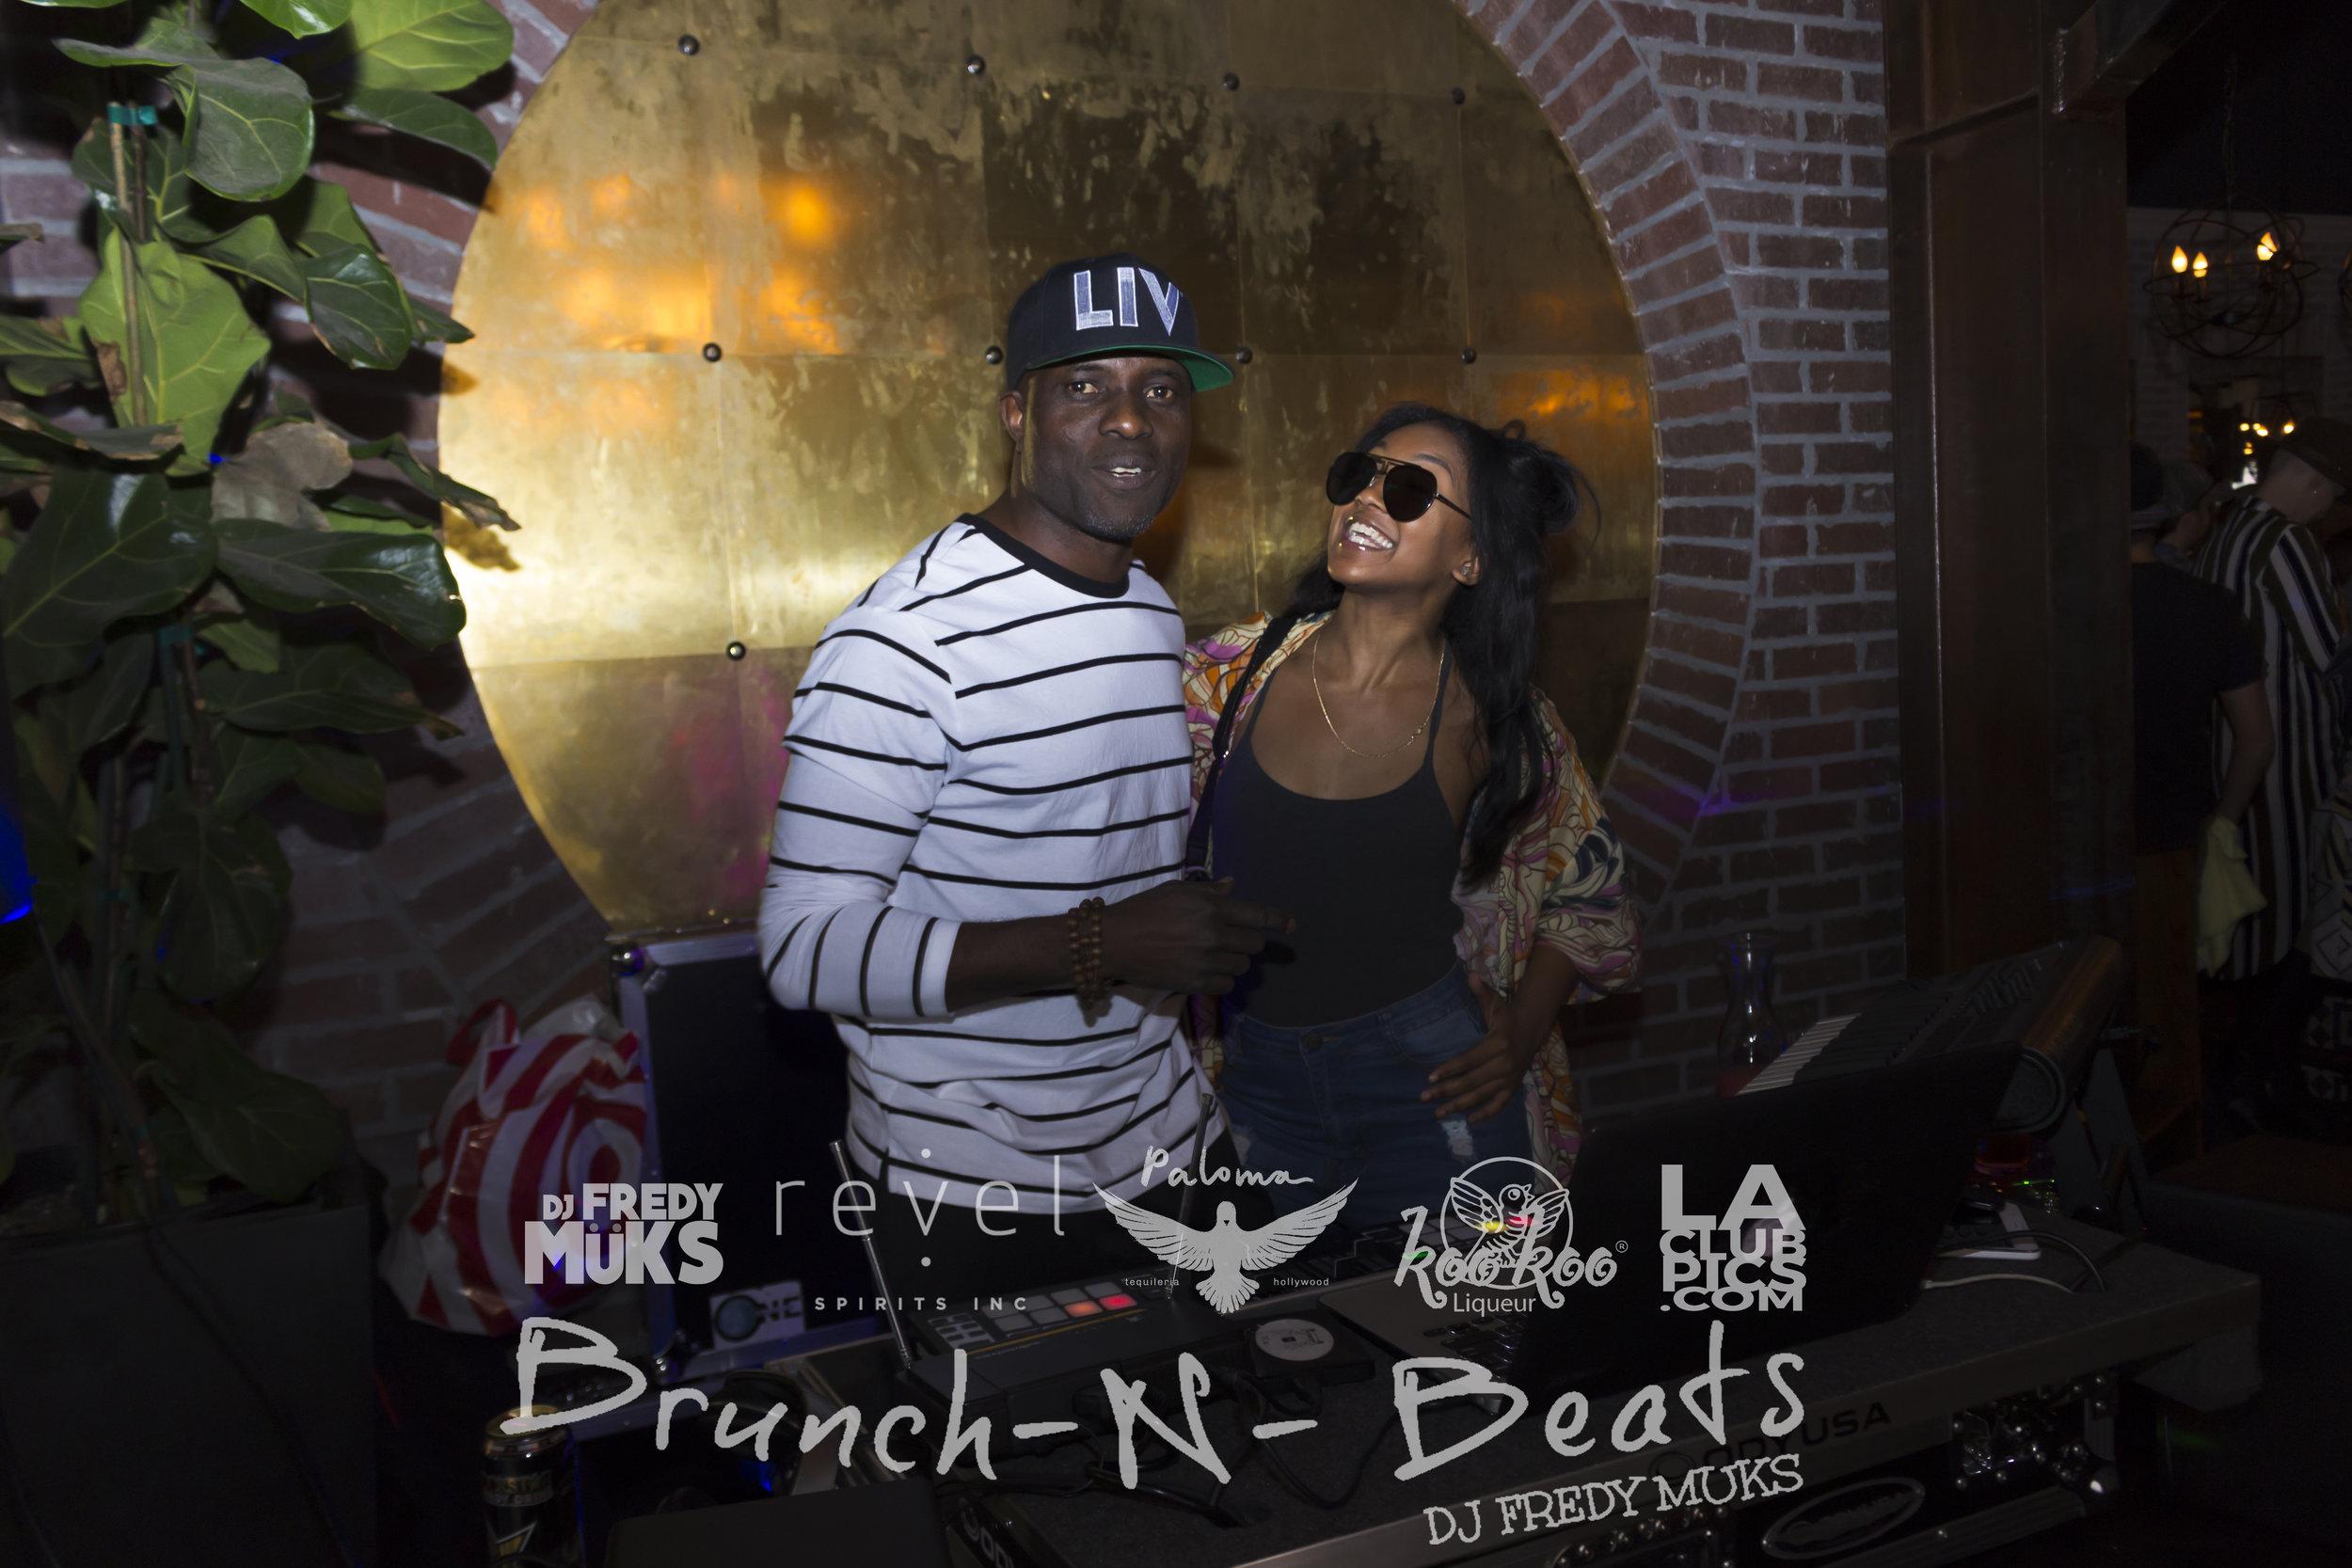 Brunch-N-Beats - Paloma Hollywood - 02-25-18_145.jpg